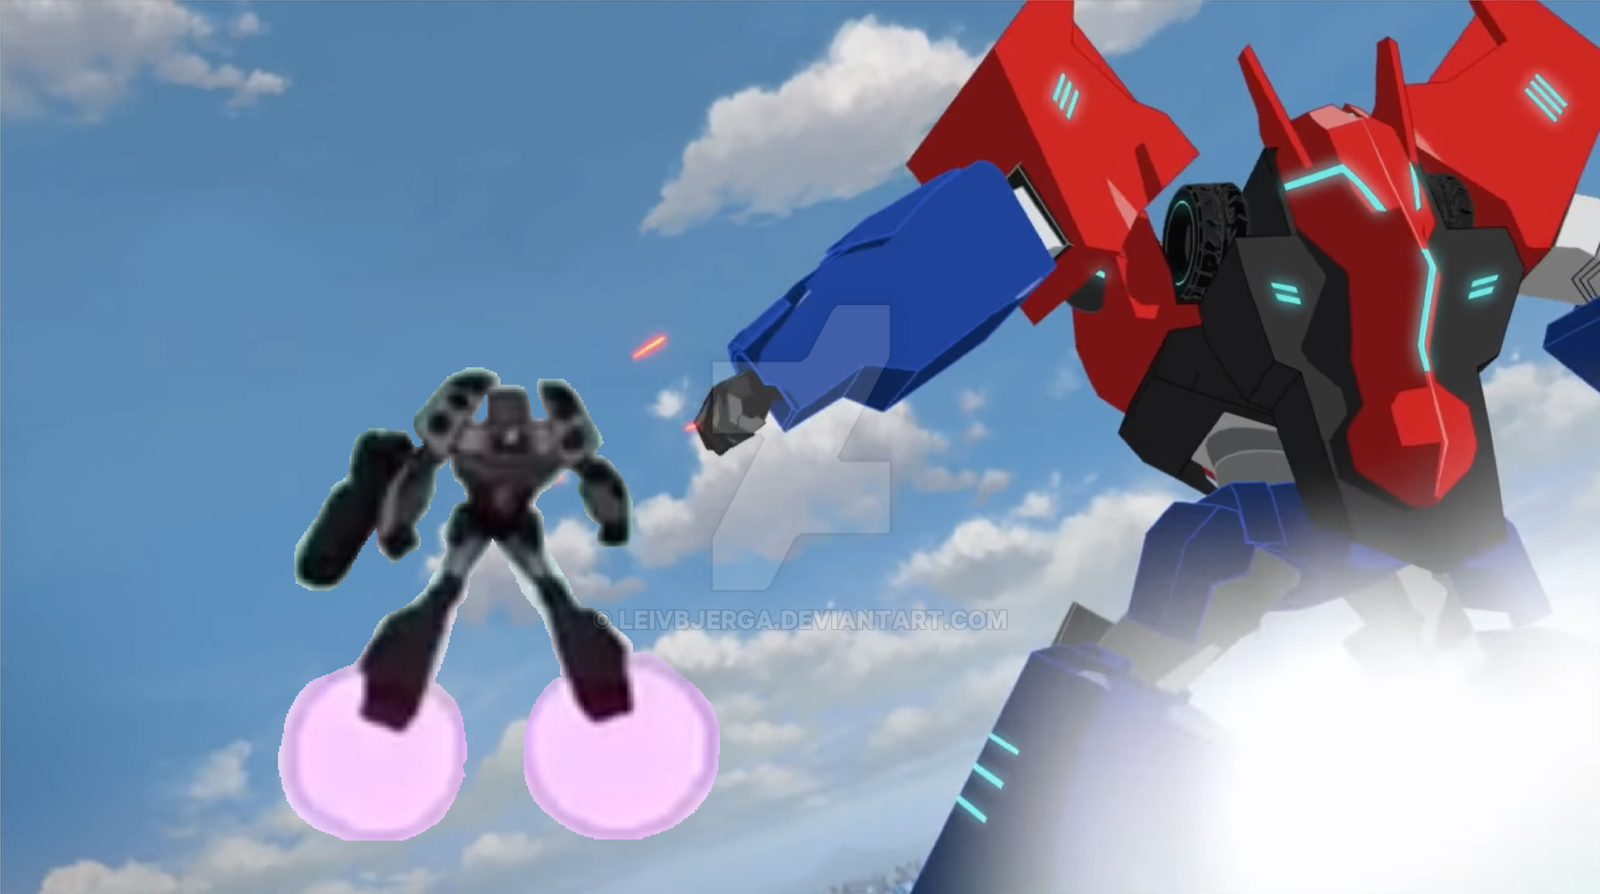 Tf optimus prime vs megatron final battle by leivbjerga on - Transformers cartoon optimus prime vs megatron ...